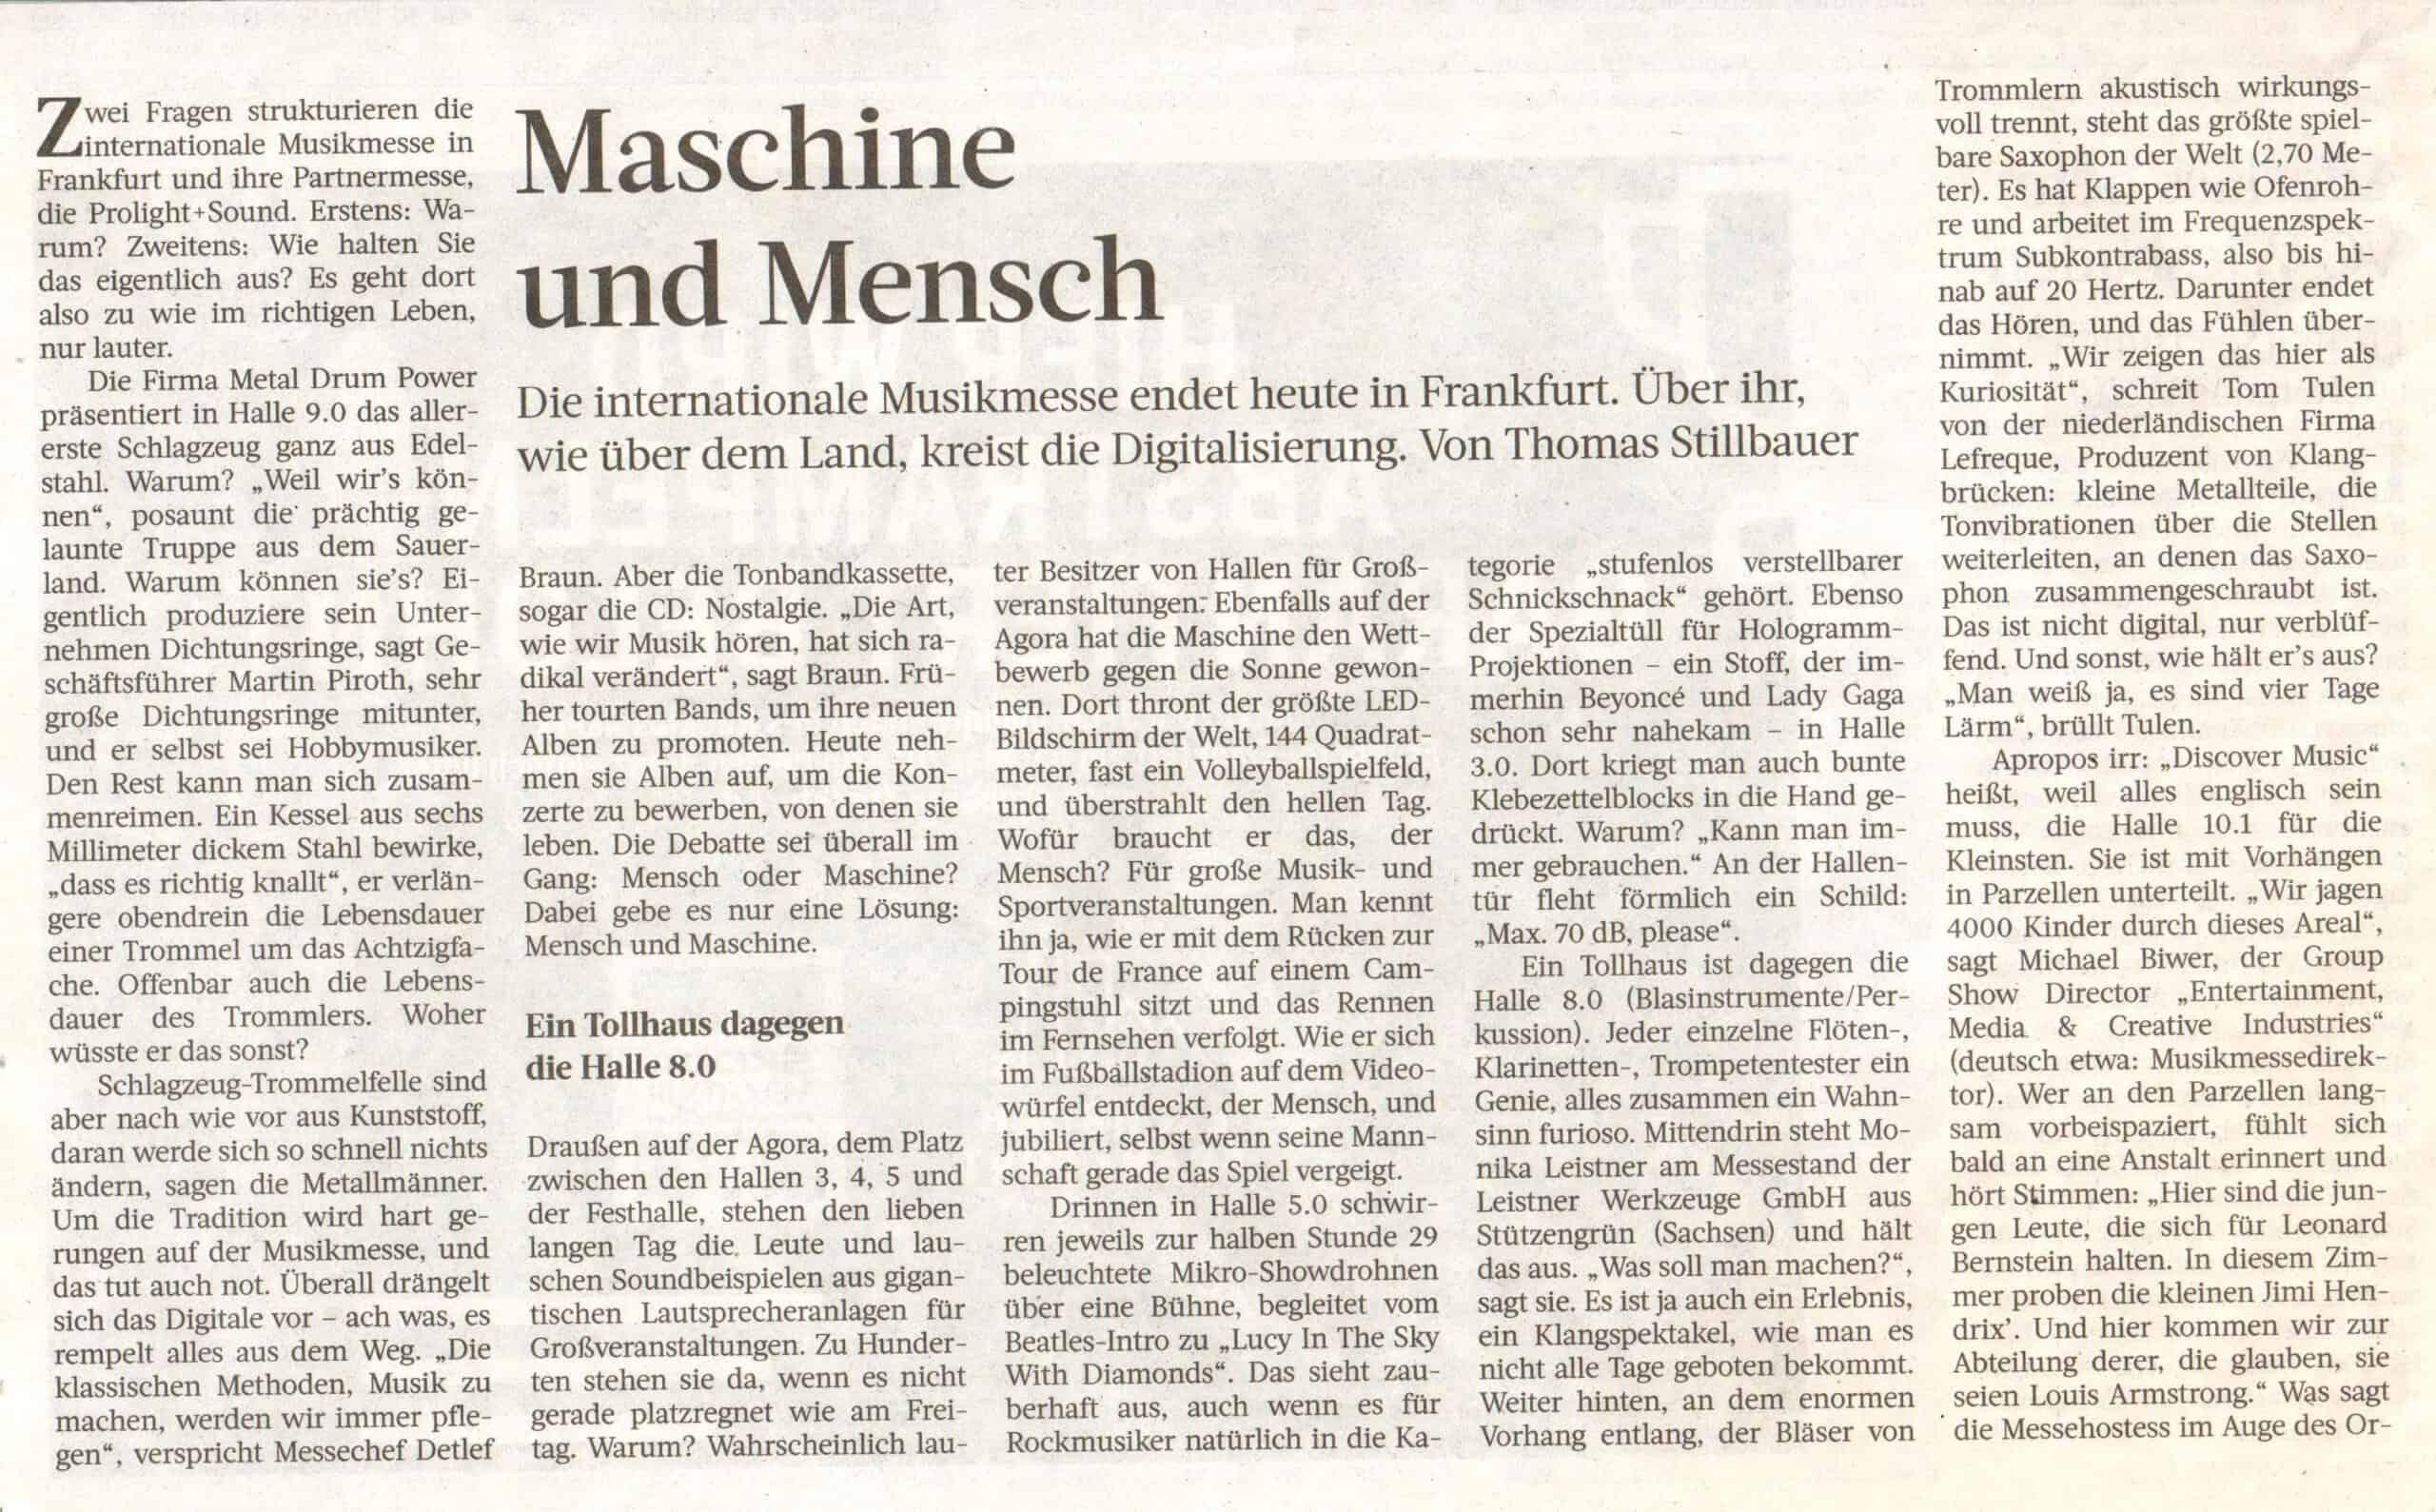 Frankfurter Rundschau, 14./15. April 2018